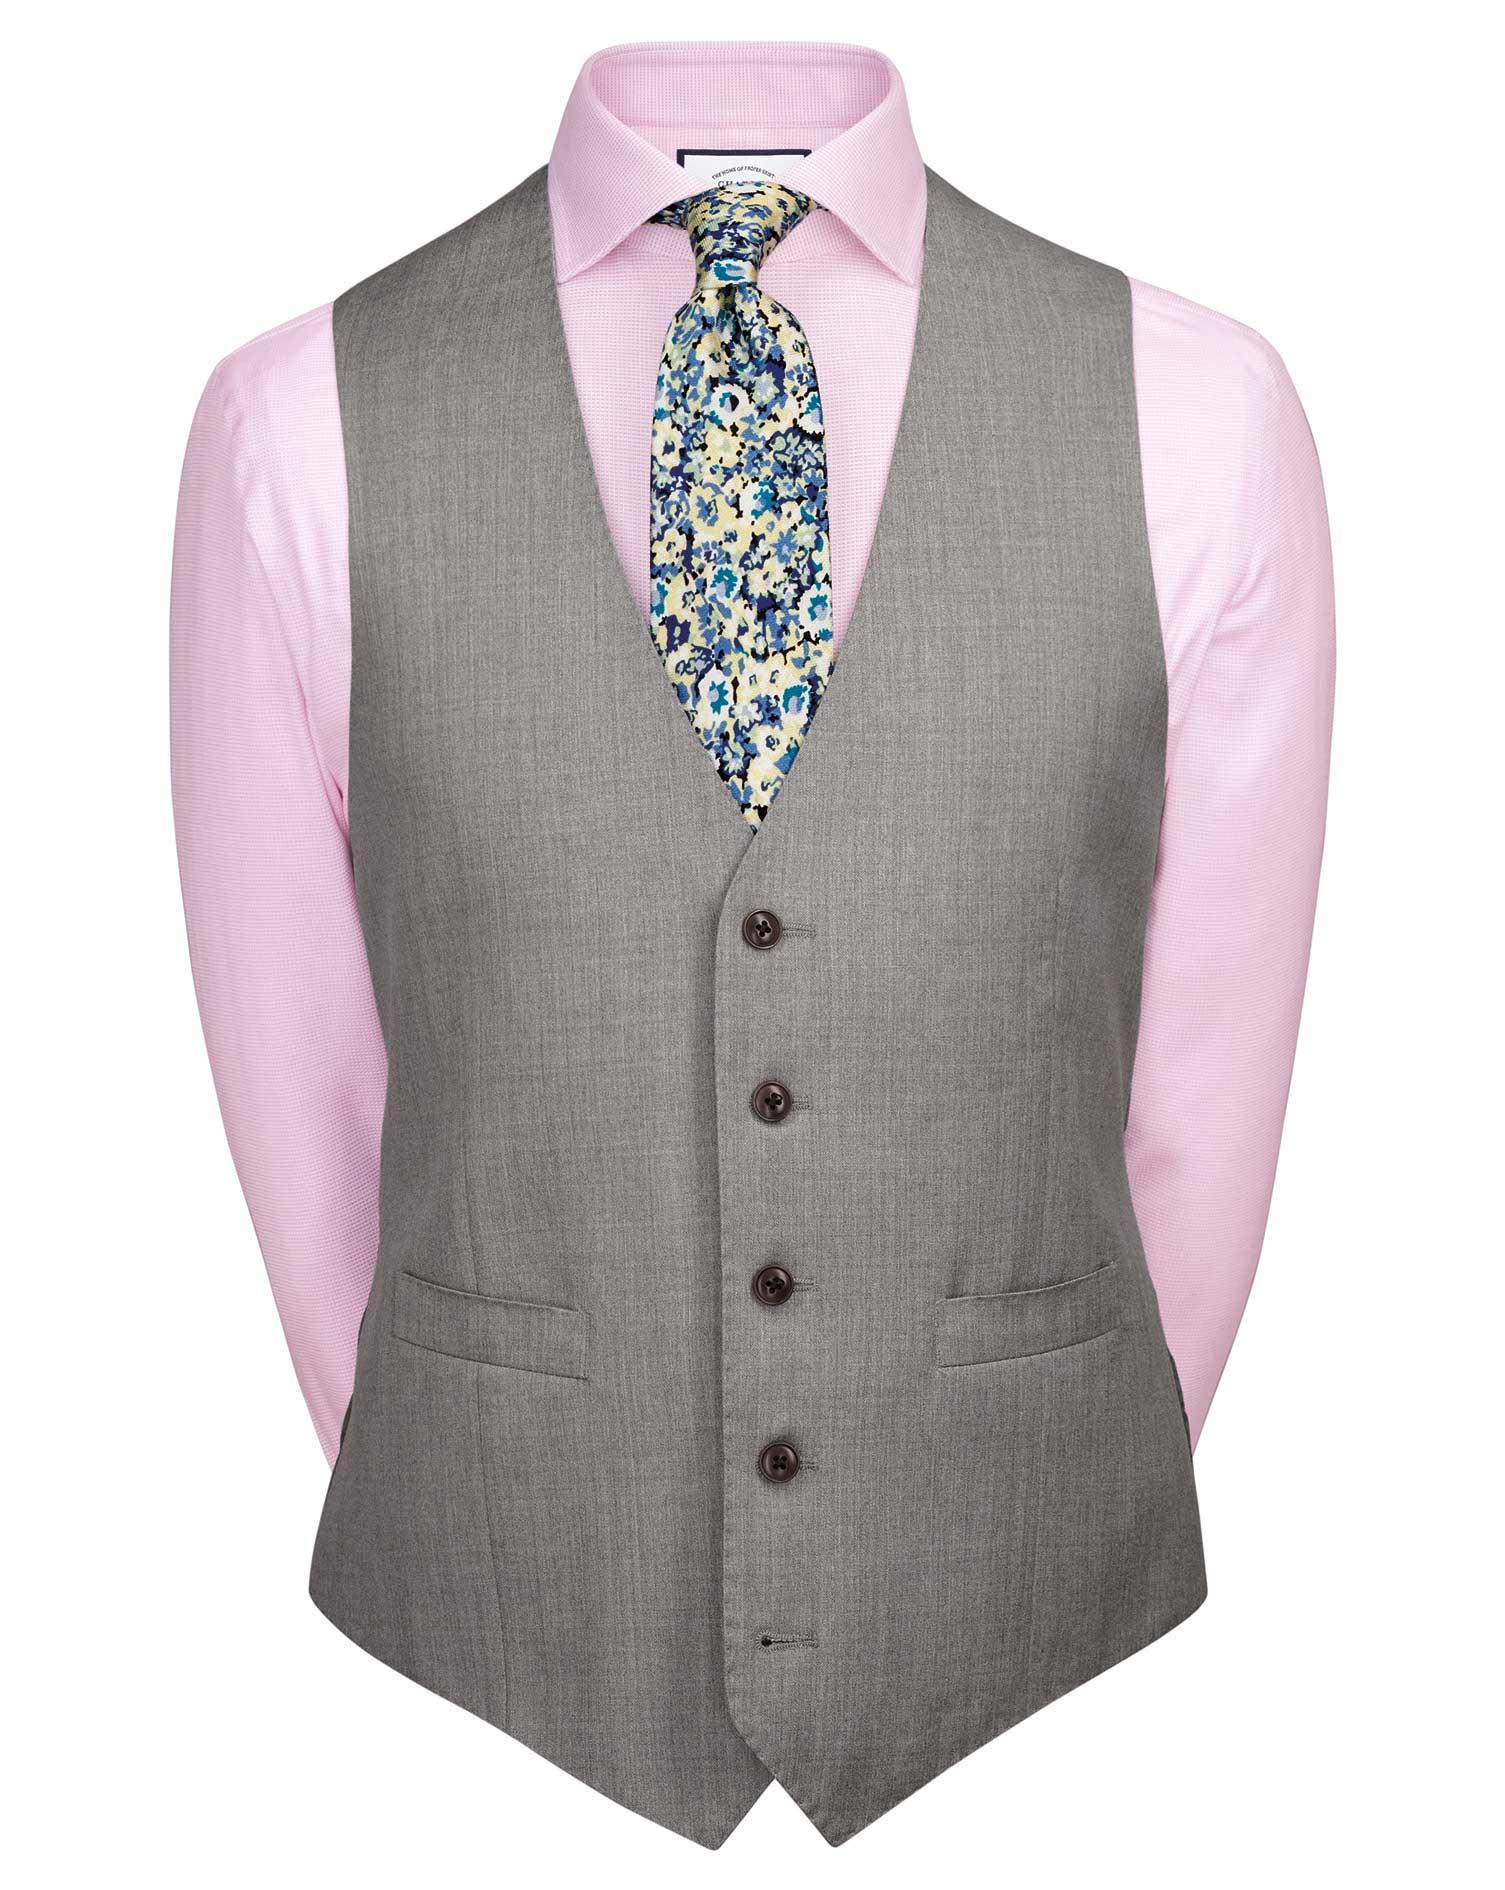 Silver Adjustable Fit Italian Suit Wool Waistcoat Size w42 by Charles Tyrwhitt